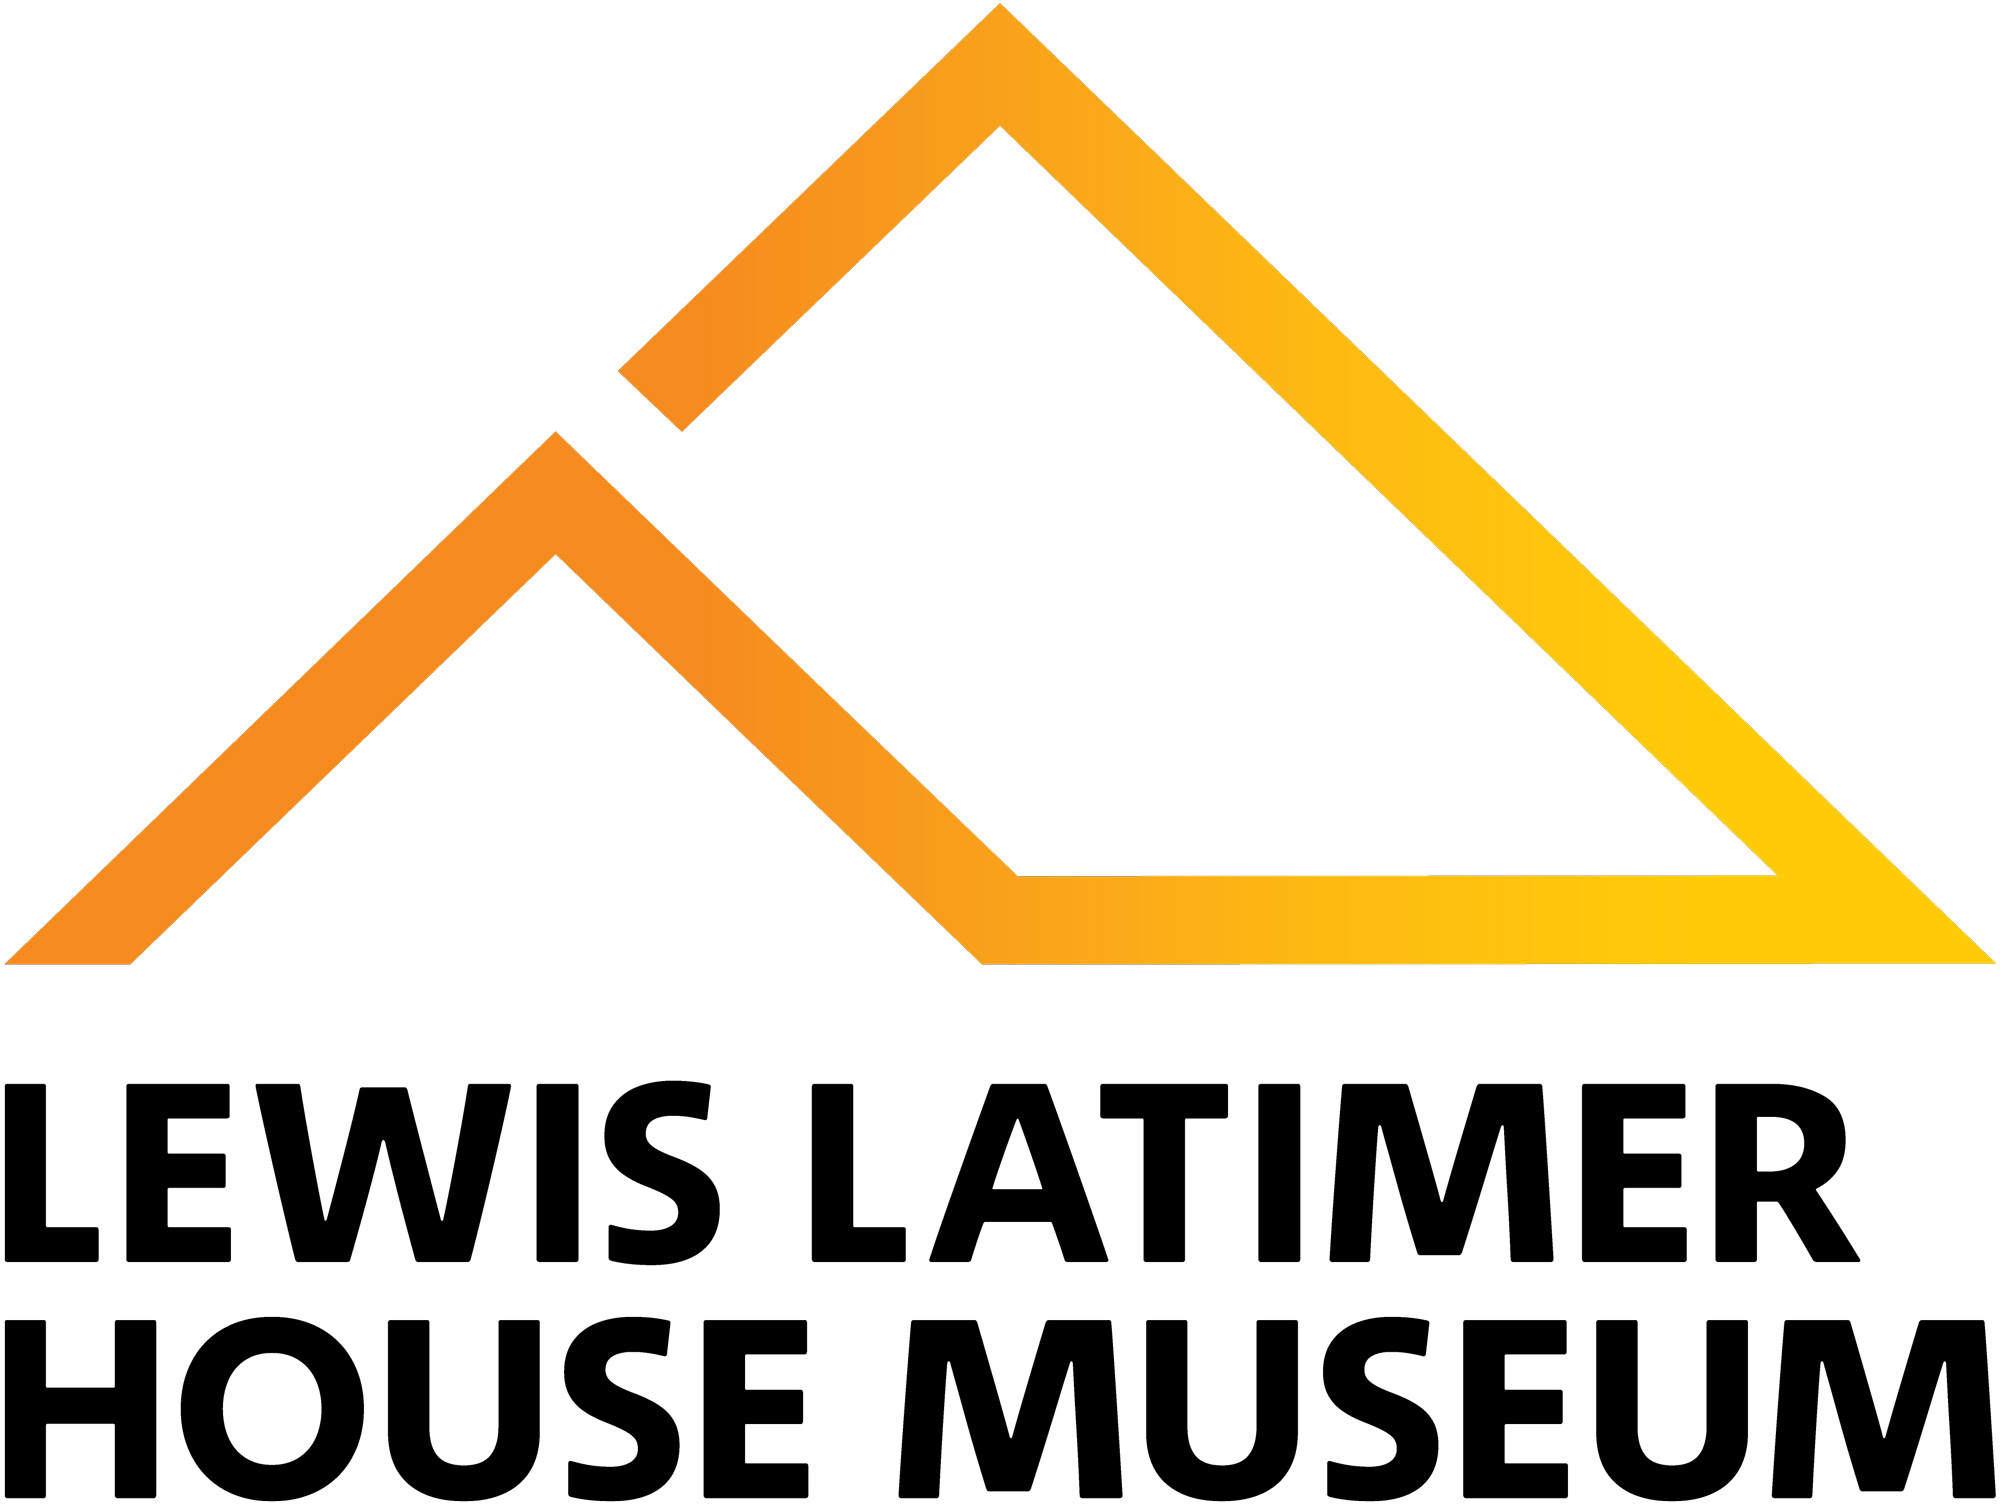 LLHM-Official-Logo-LG-WEB.jpg